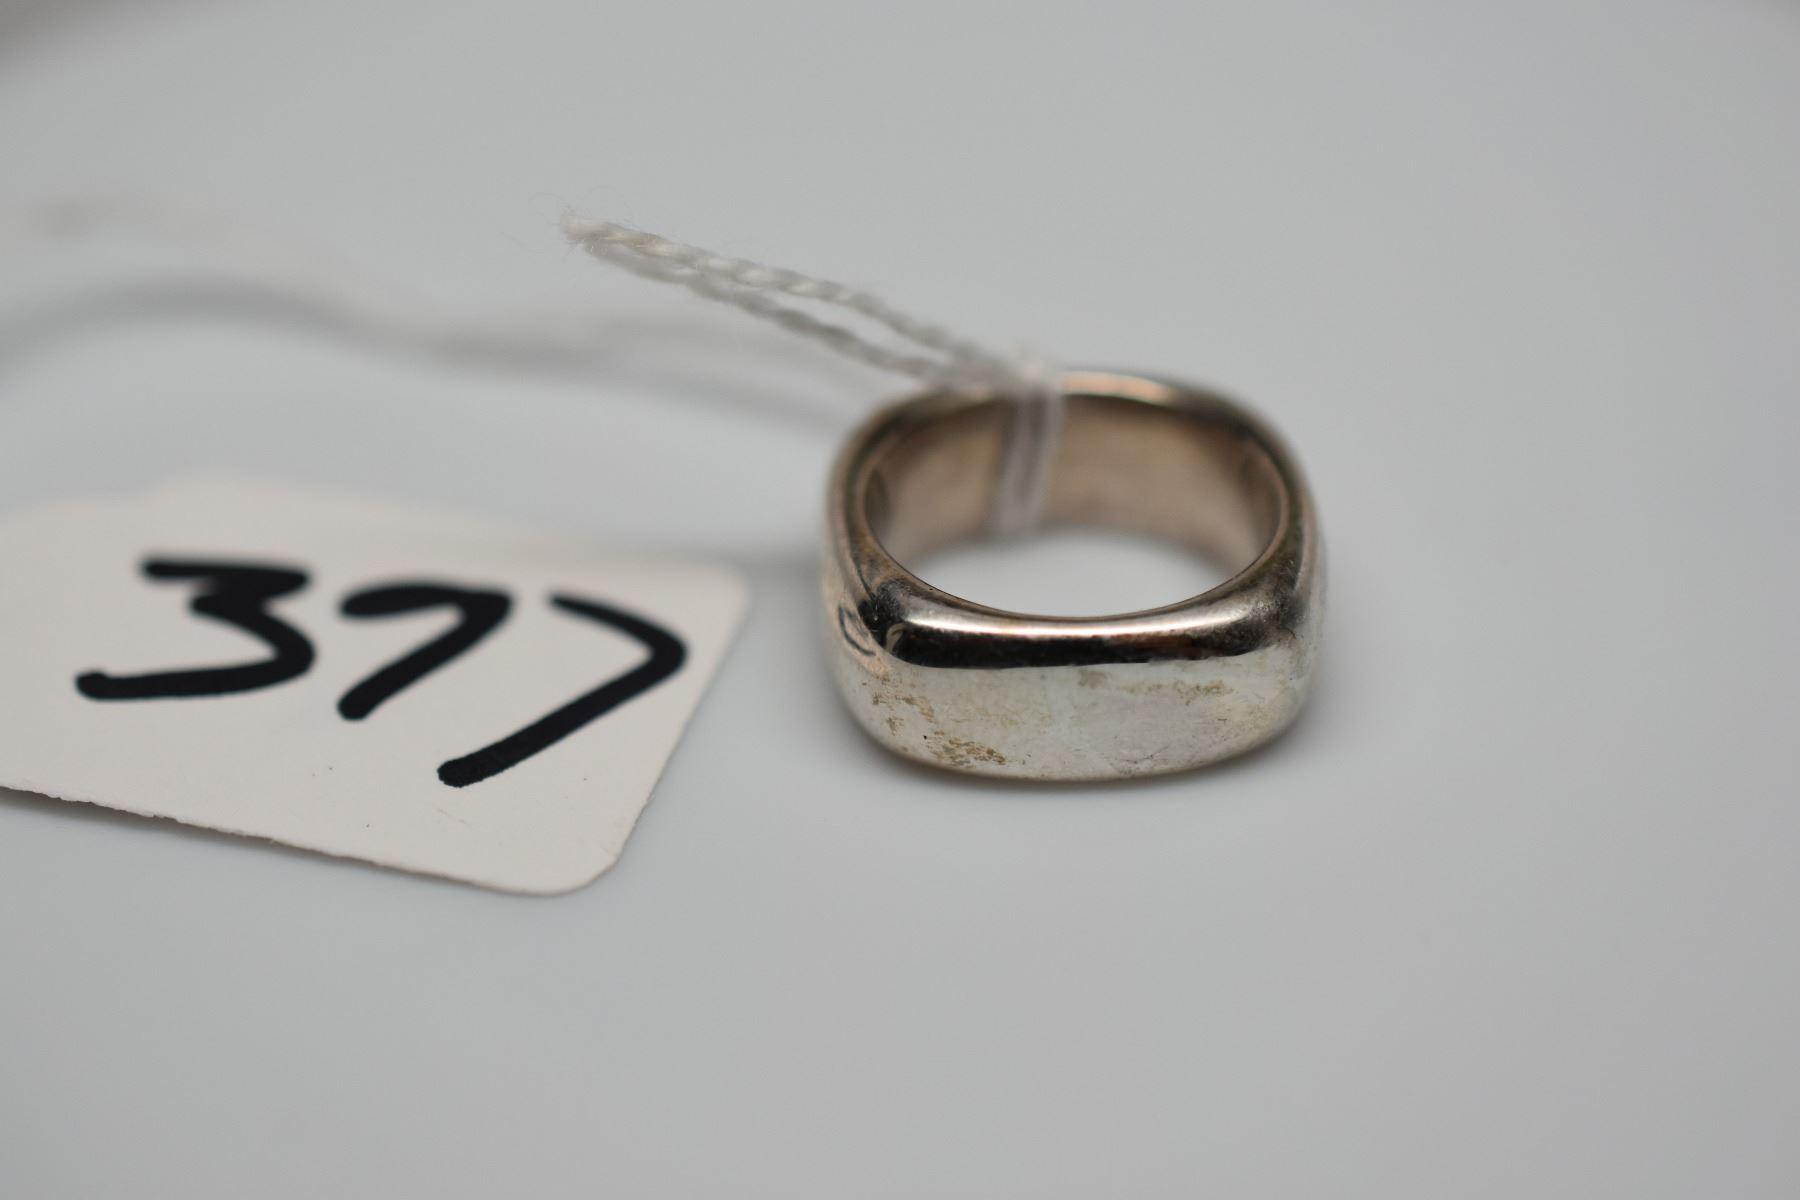 6a3e781da Sterling Silver Square Cushion Ring Size 6 · Image 2 : Tiffany & Co. Sterling  Silver Square Cushion Ring Size ...